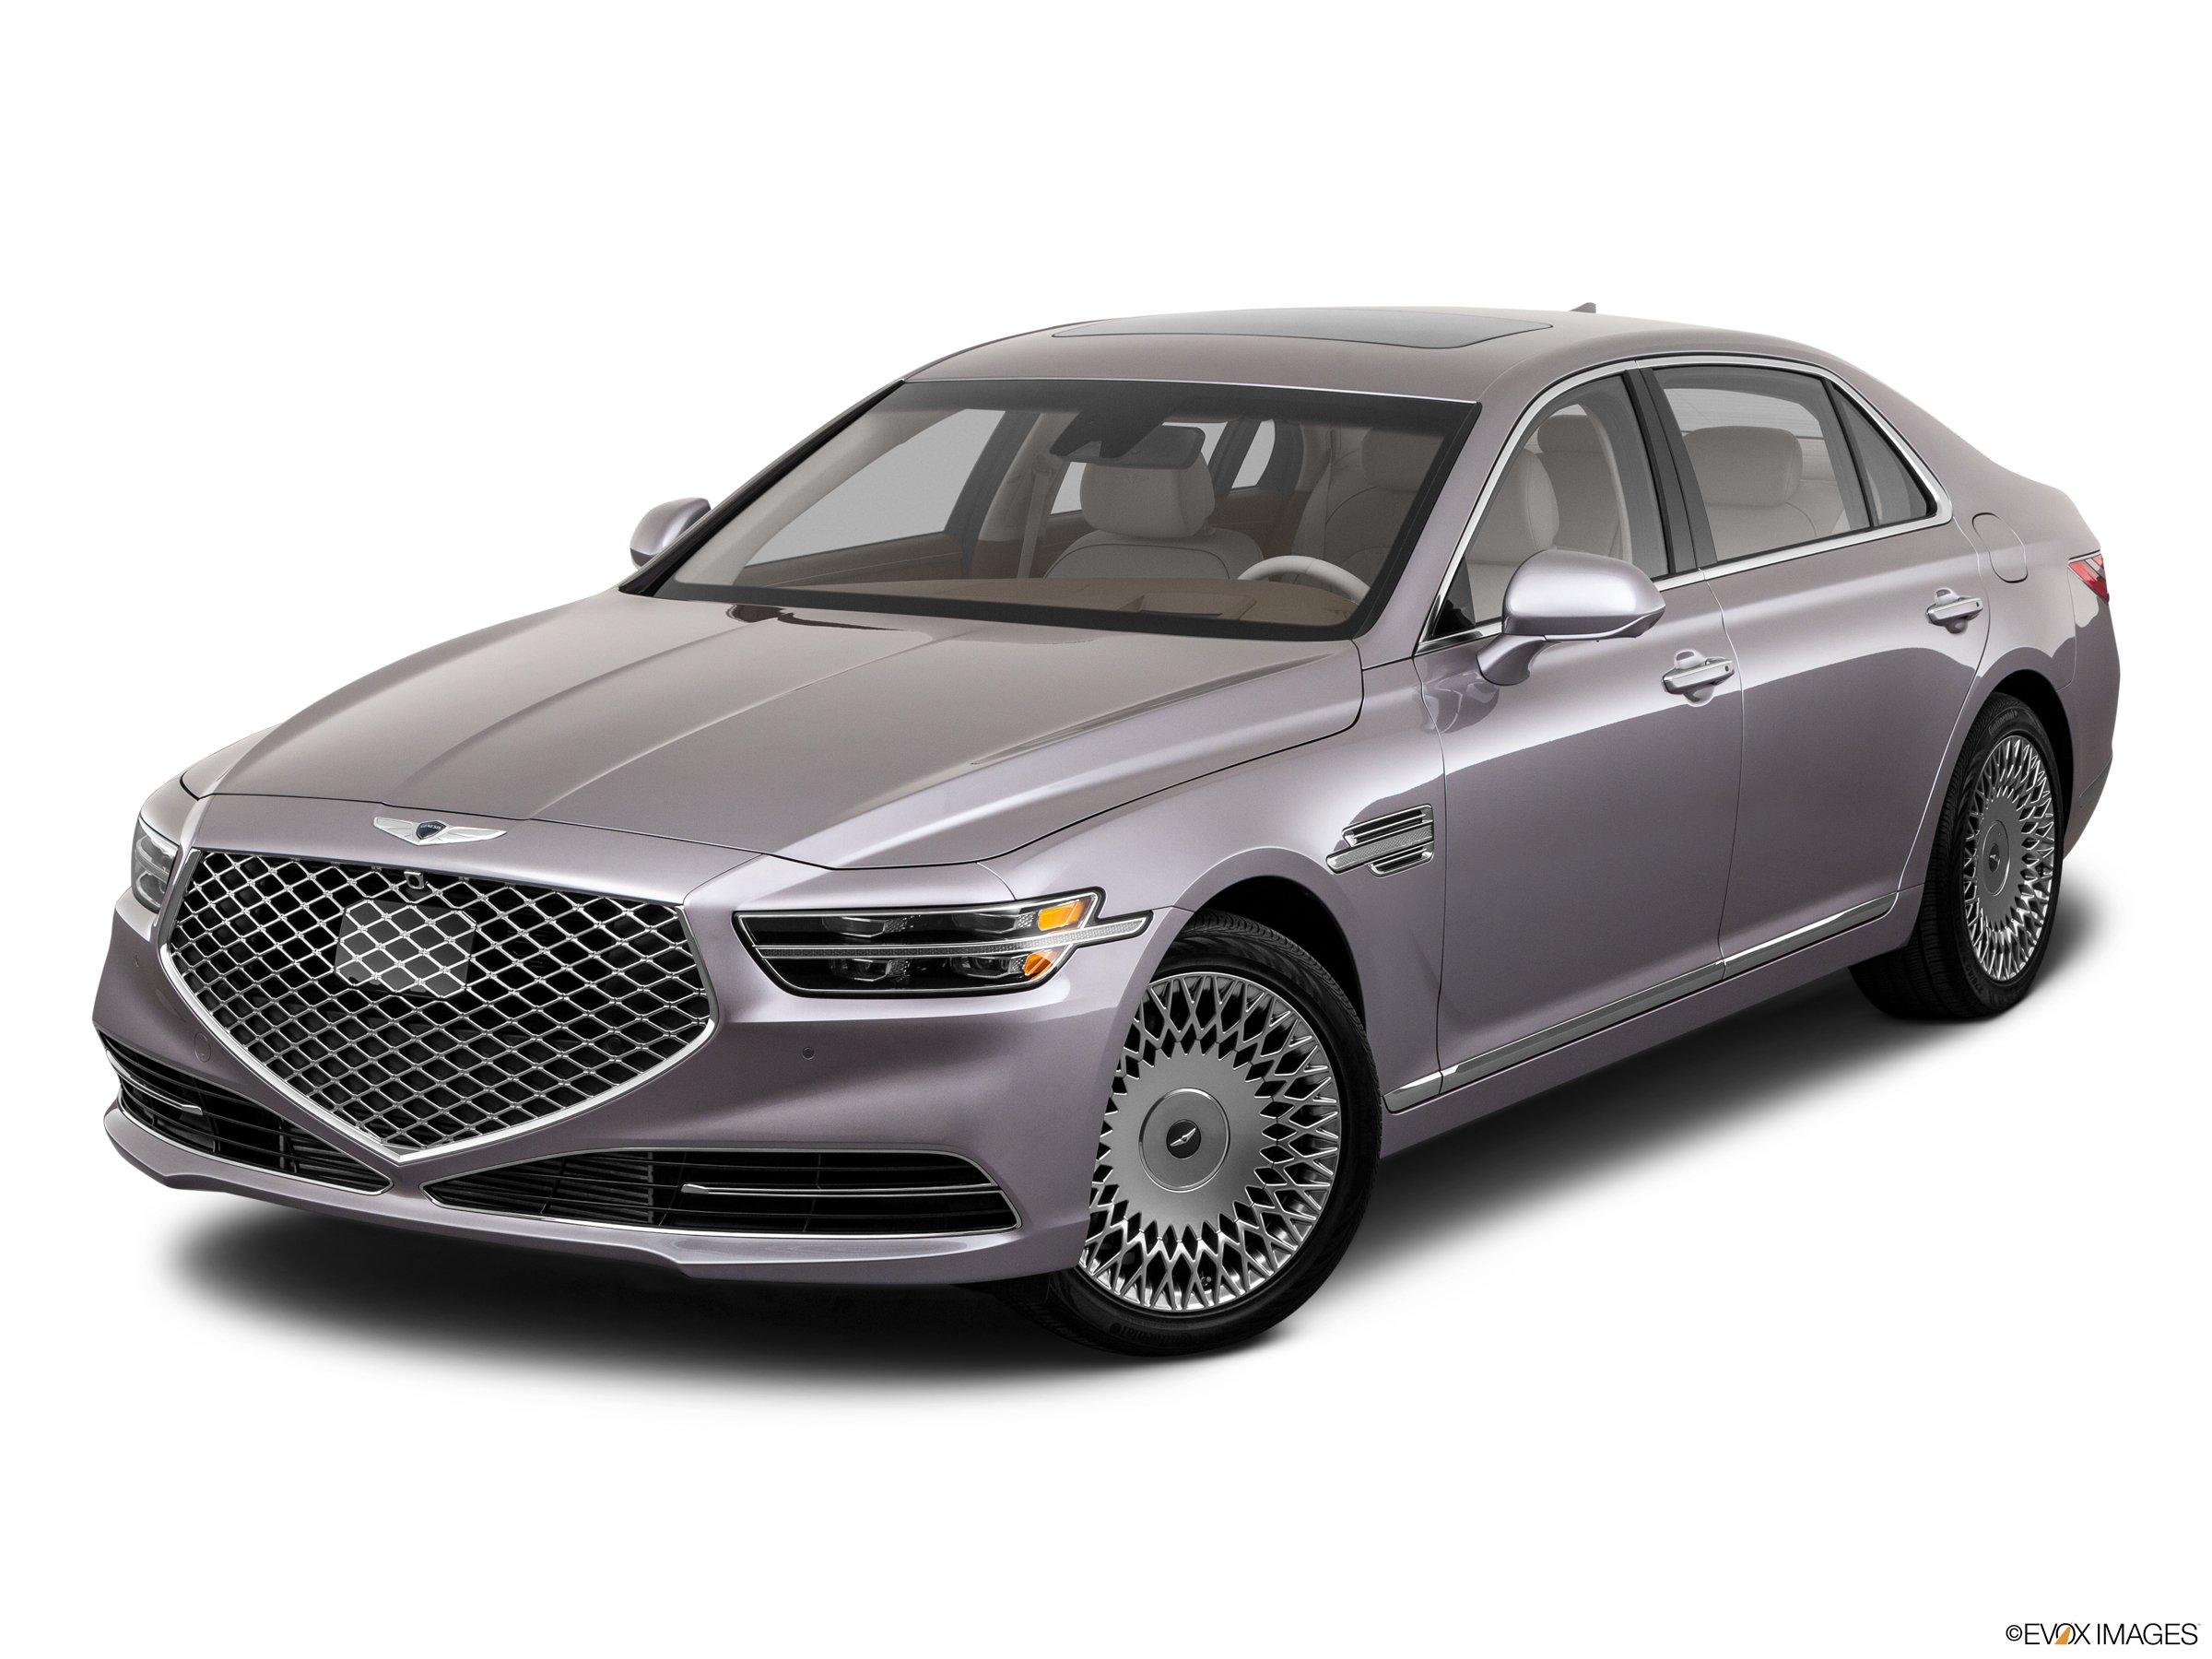 2020 Genesis G90 3.3T Premium RWD sedan